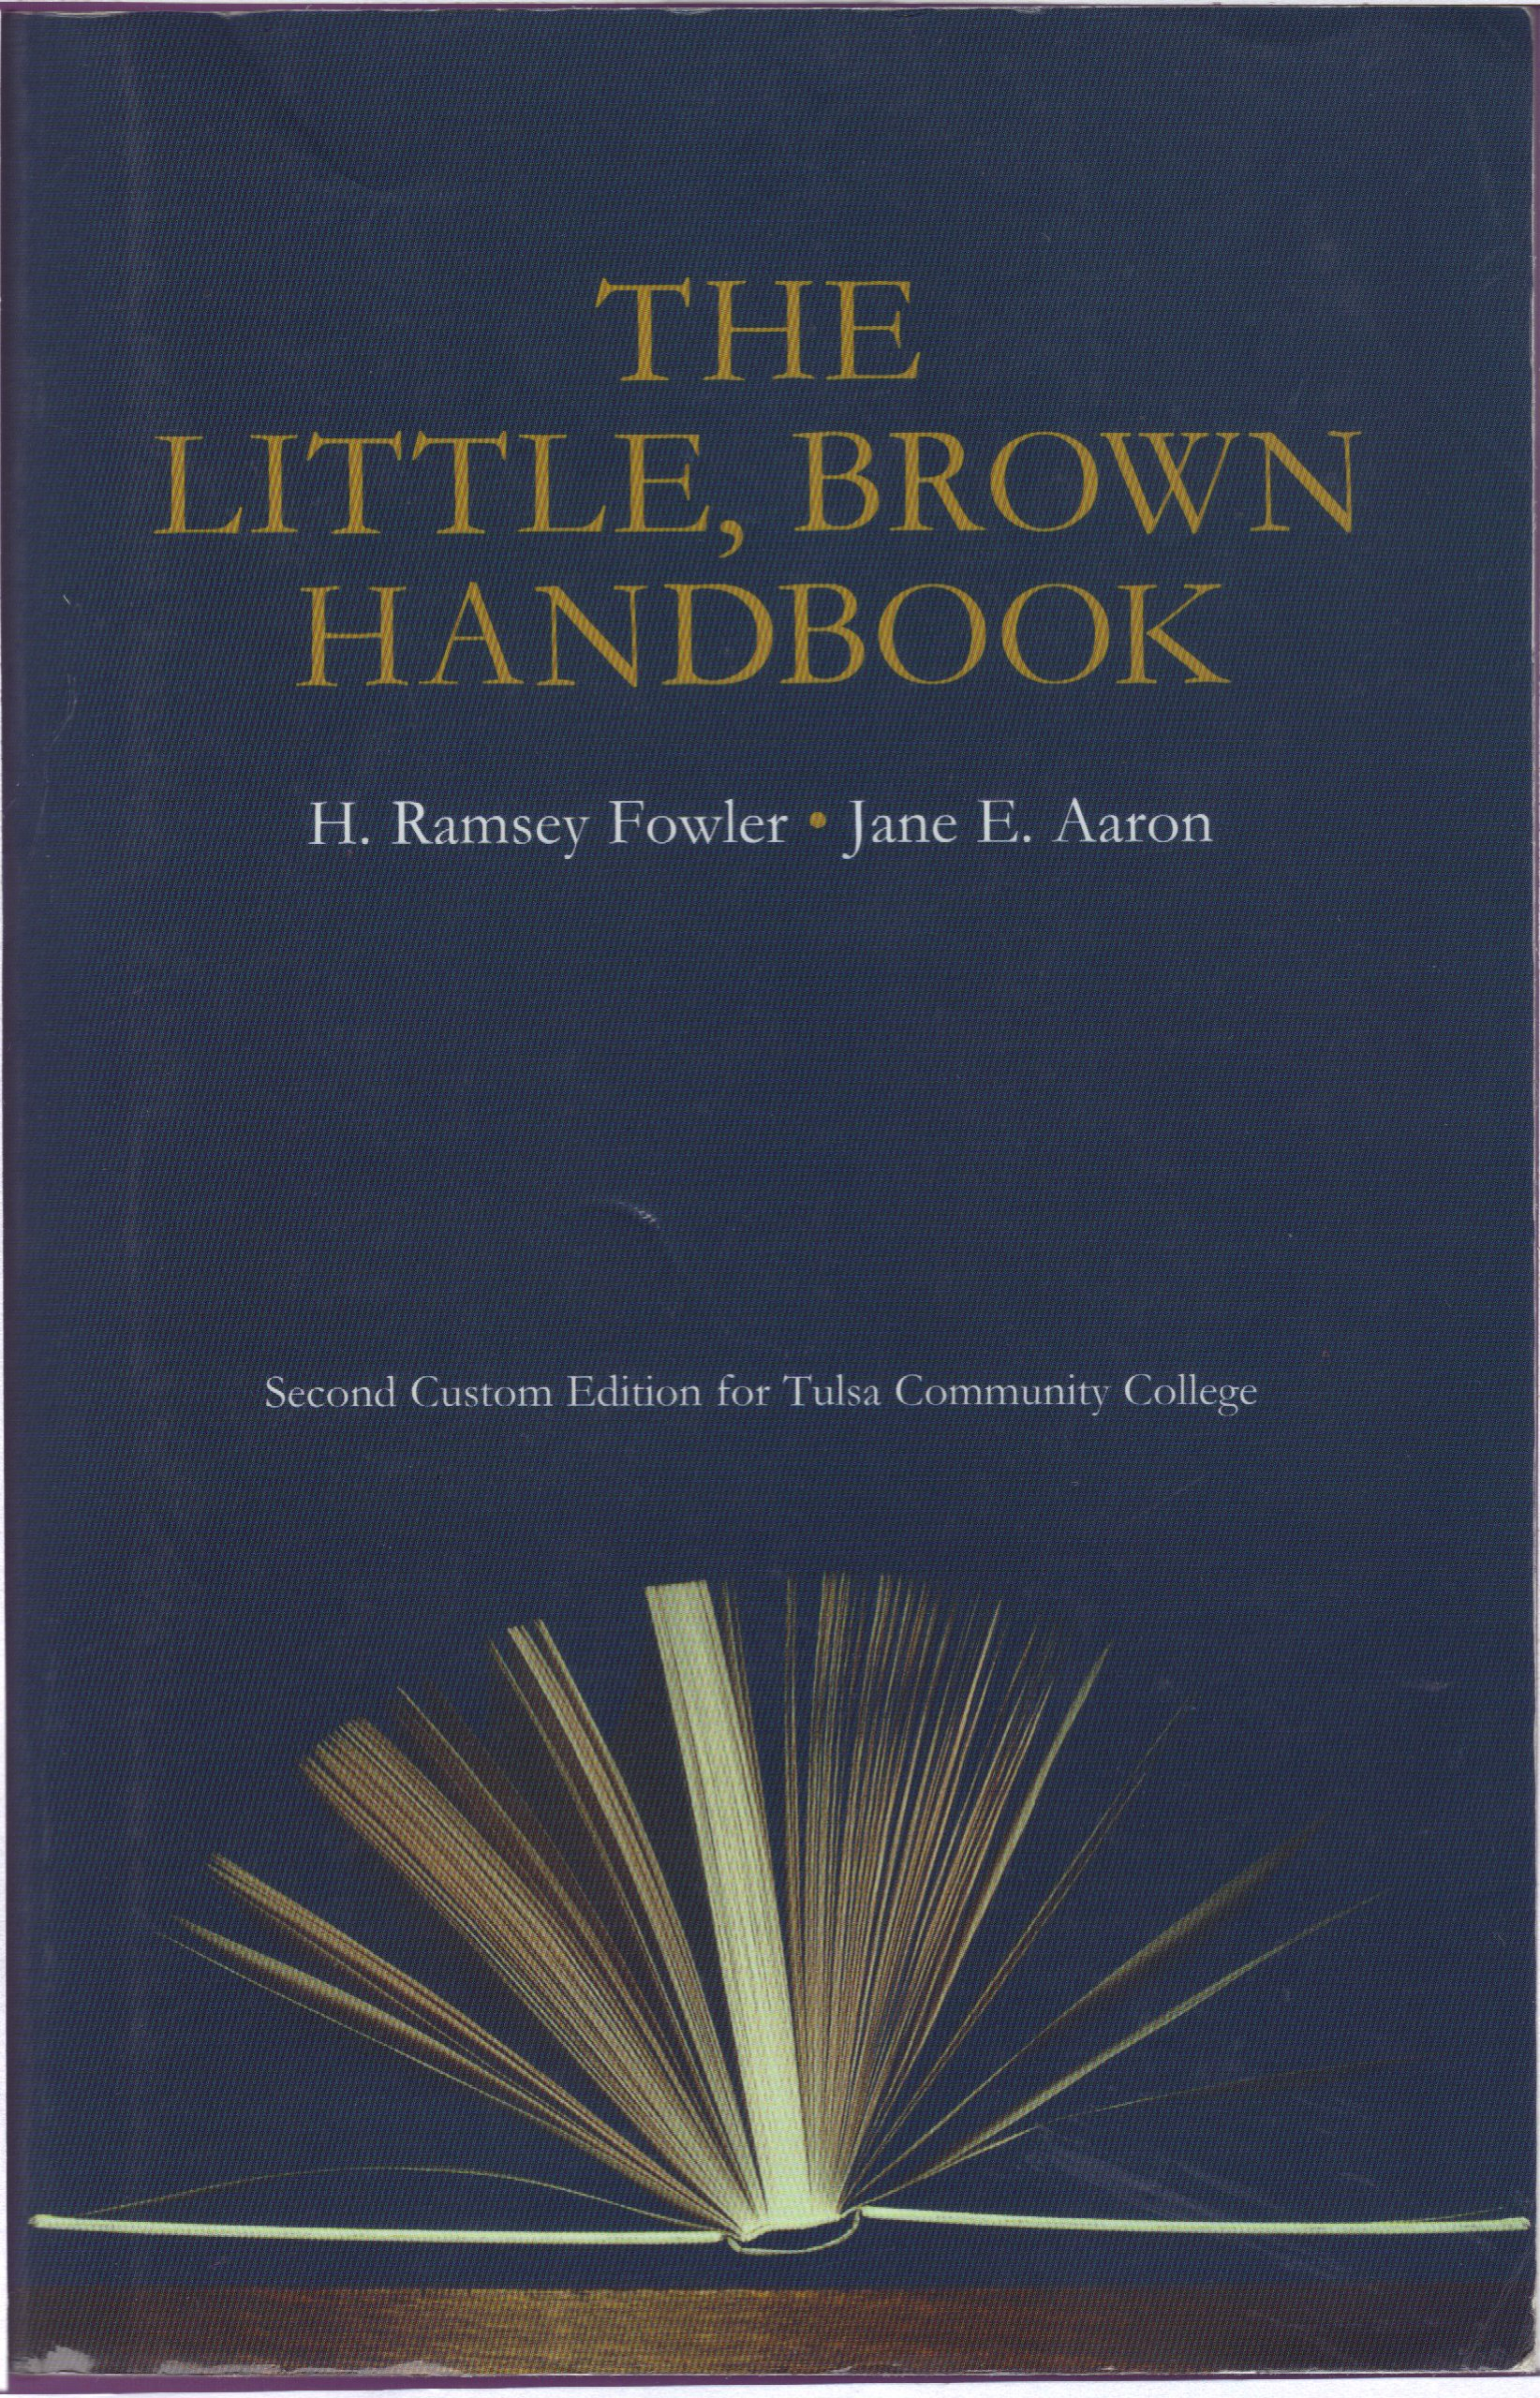 The Little Brown Handbook (Second Custom Edition for Tulsa Community  College): H. Ramsey Fowler; Jane E. Aaron: 9781256707028: Amazon.com: Books